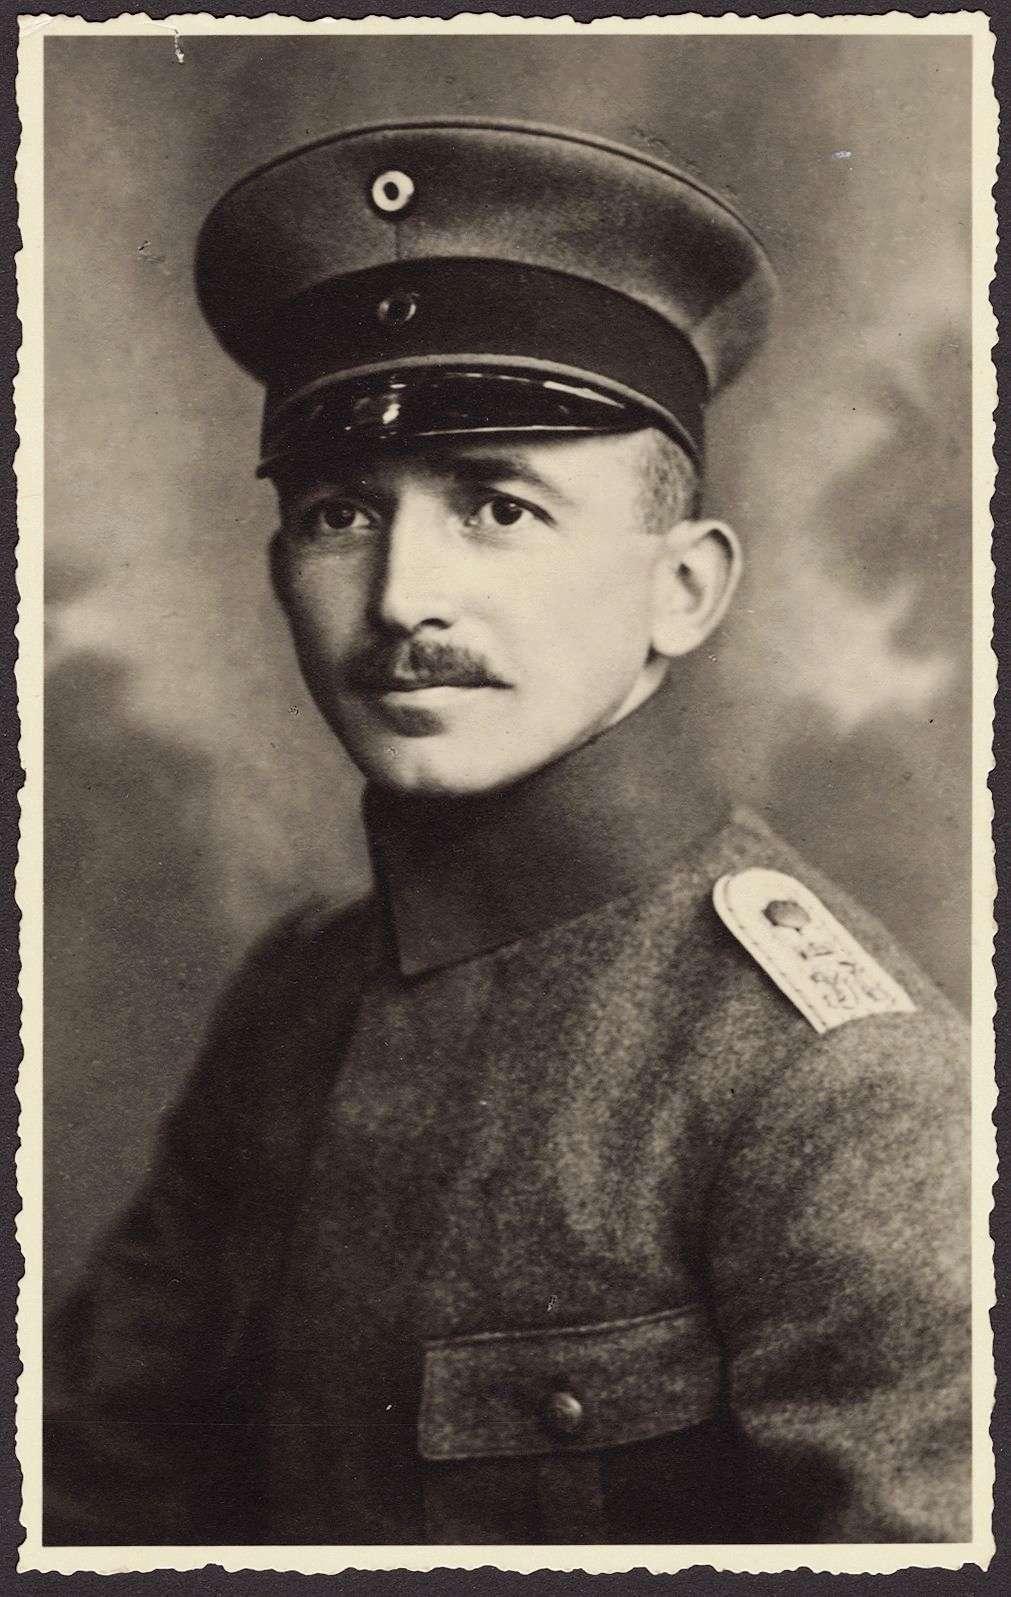 Dittus, Hermann, Bild 1